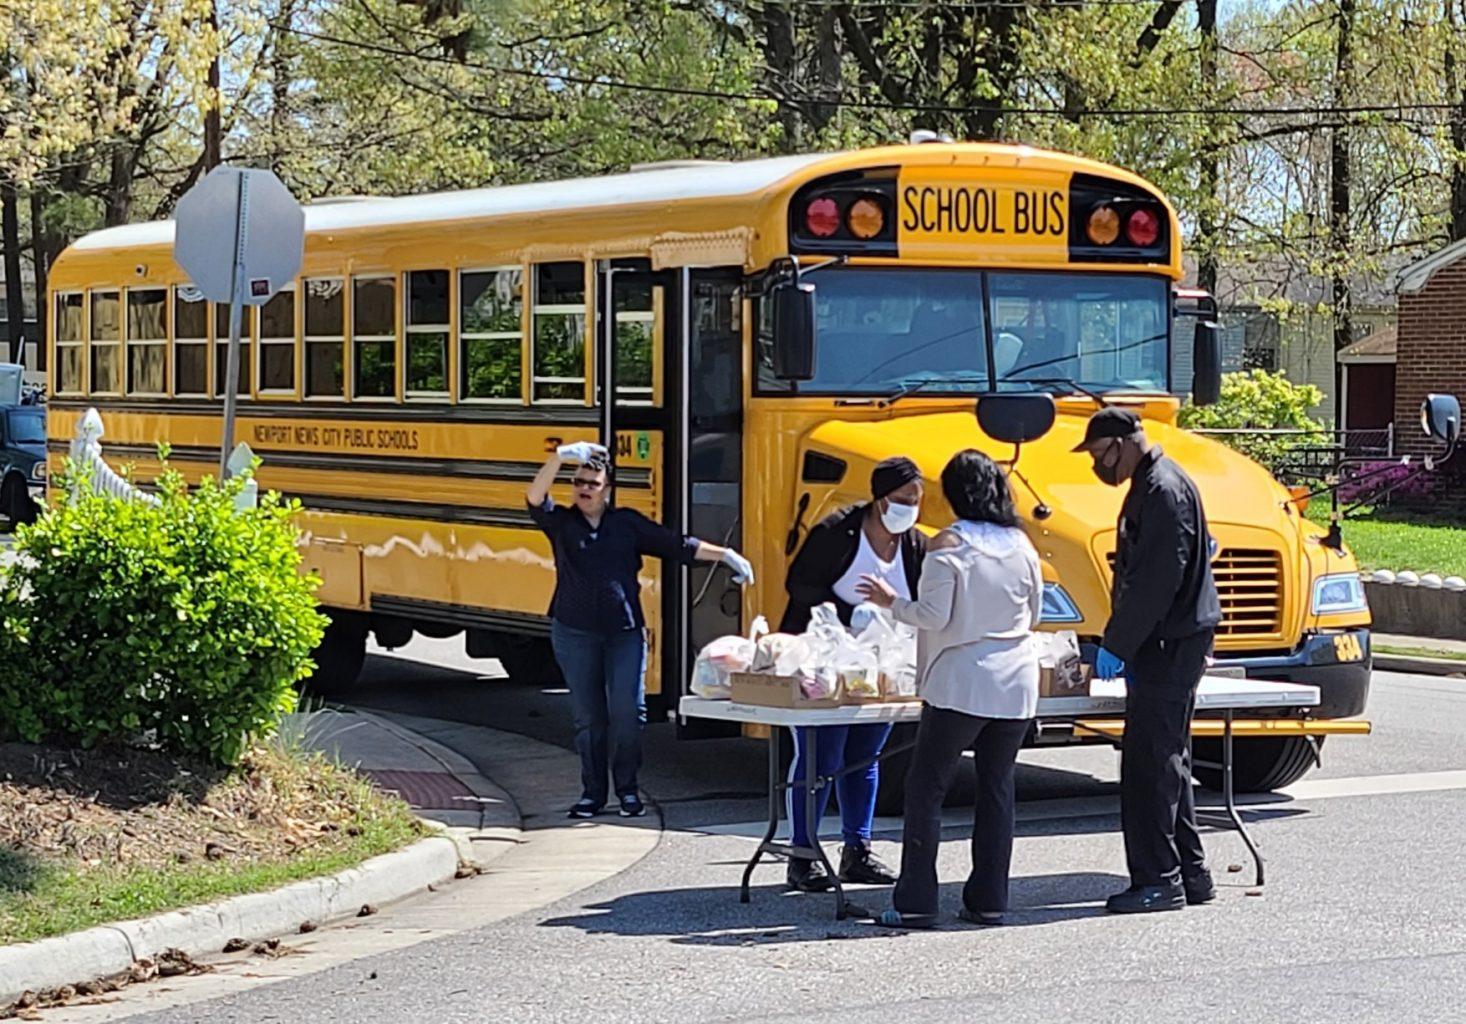 Newport News Public Schools, uses propane school buses to get food to children.